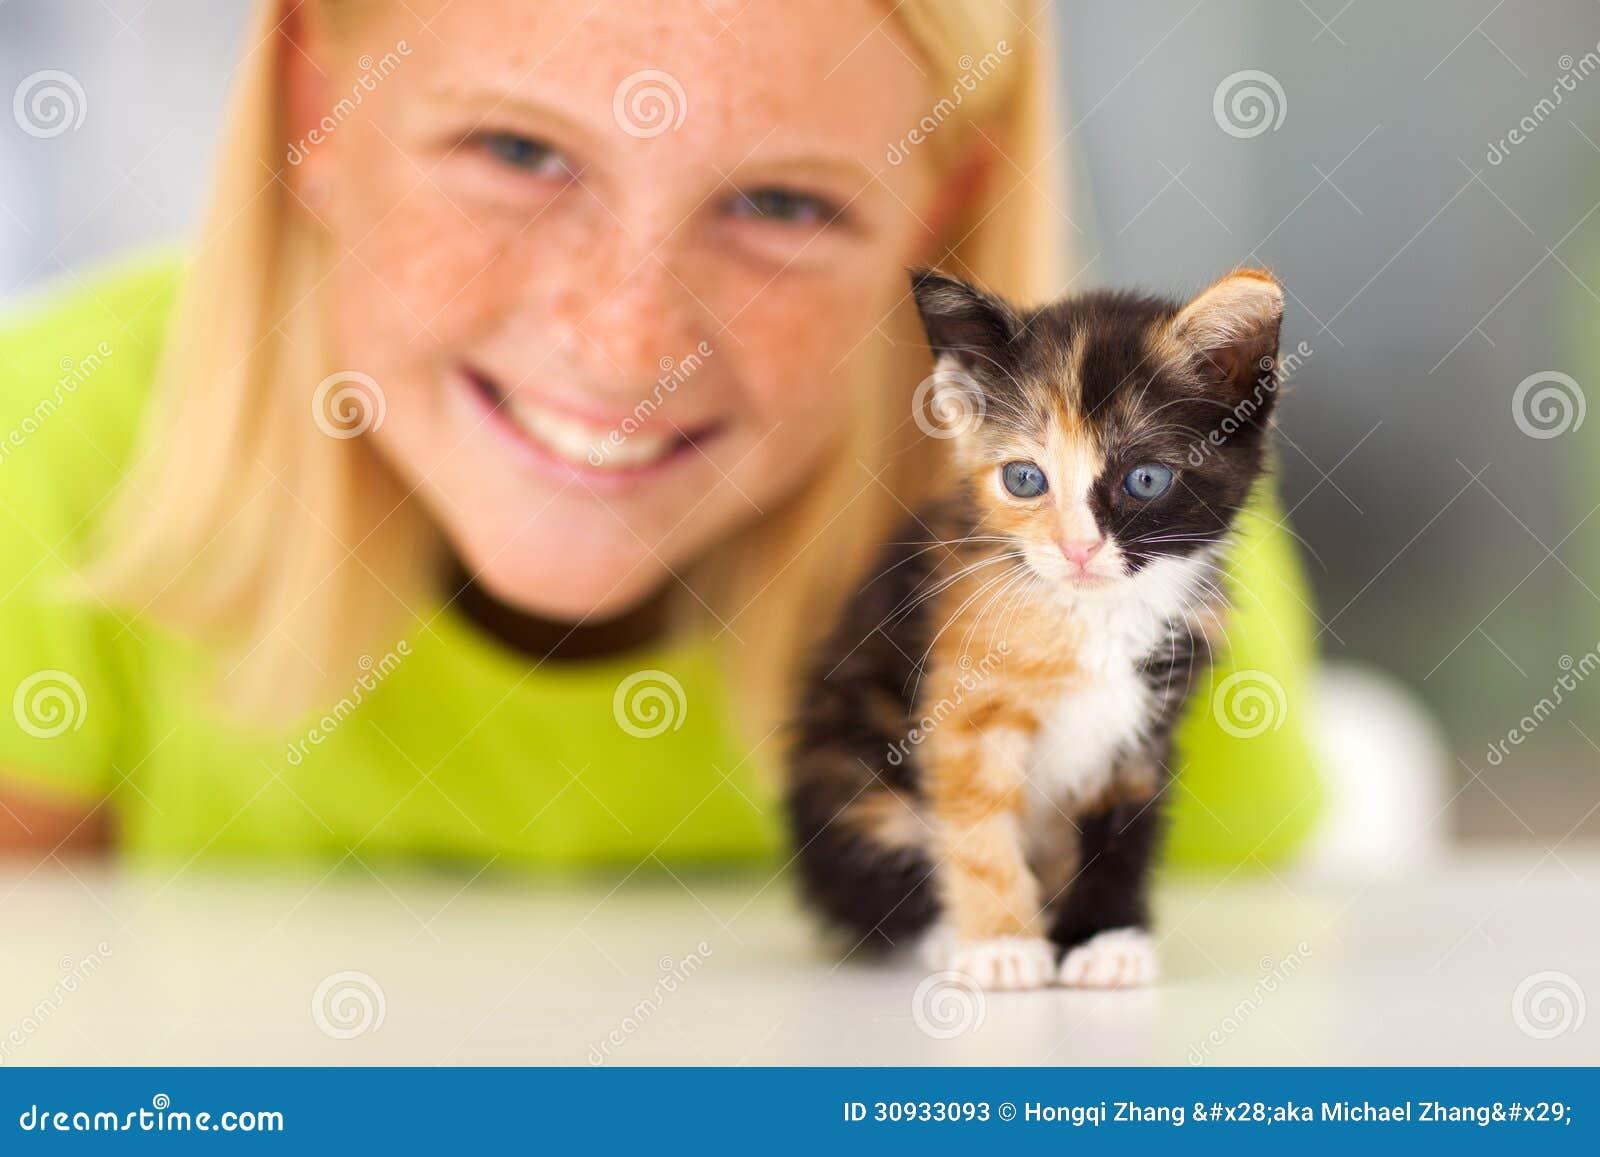 kitty girls Cute teen